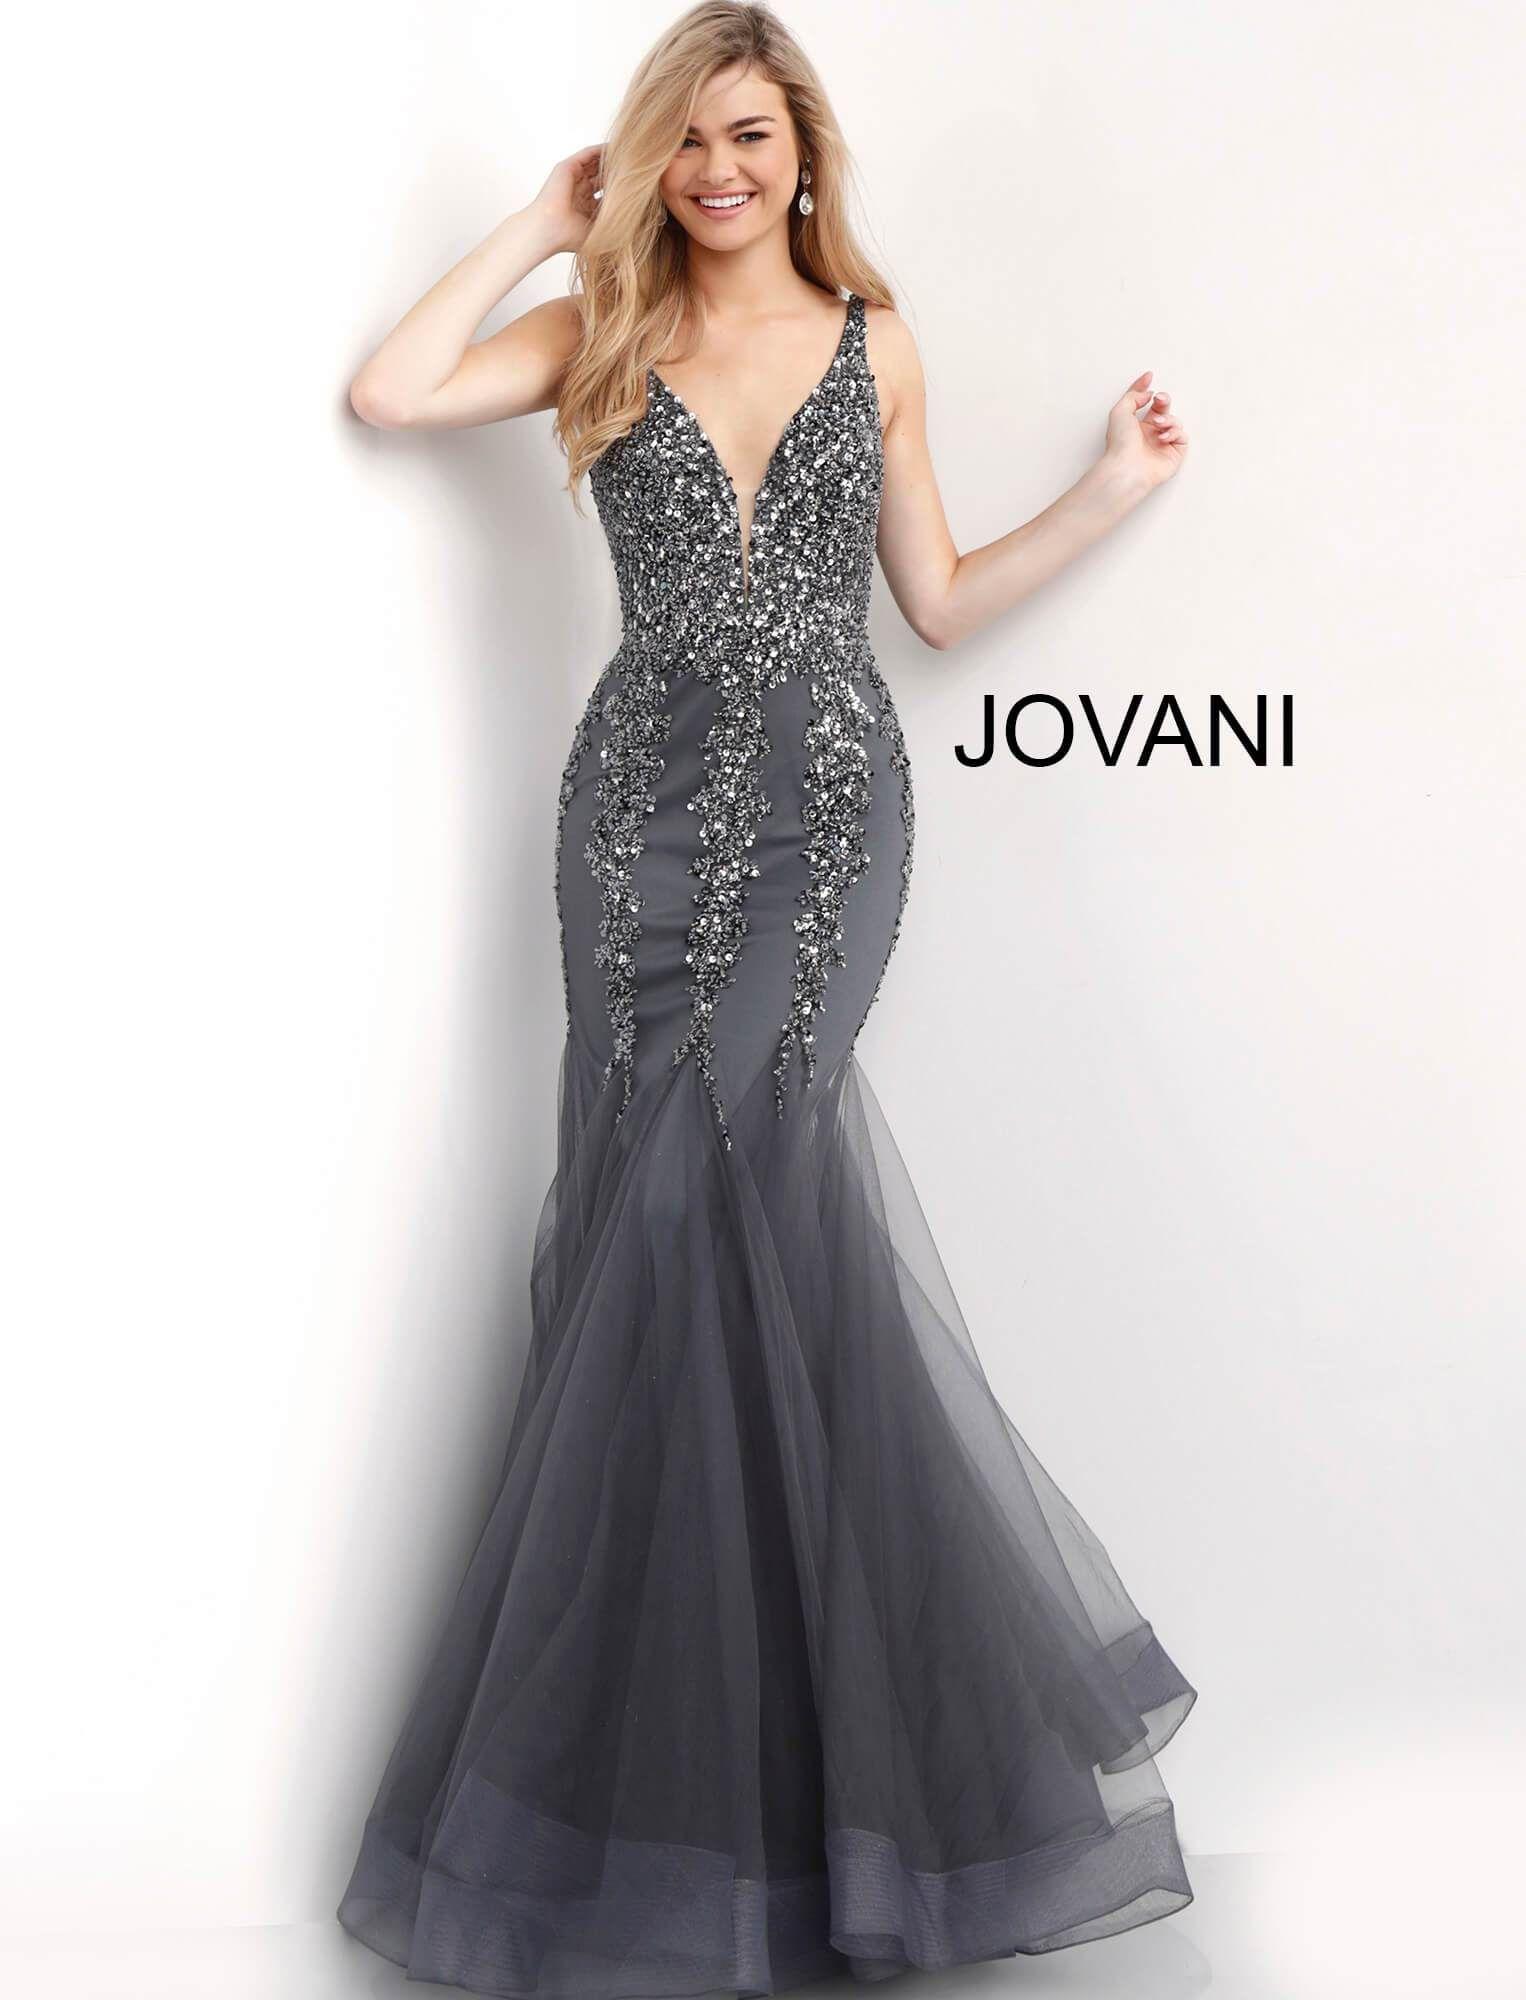 2cb01986f3e39 Jovani prom dress style 63700 in 2019 | Prom 2019 | Prom dresses ...